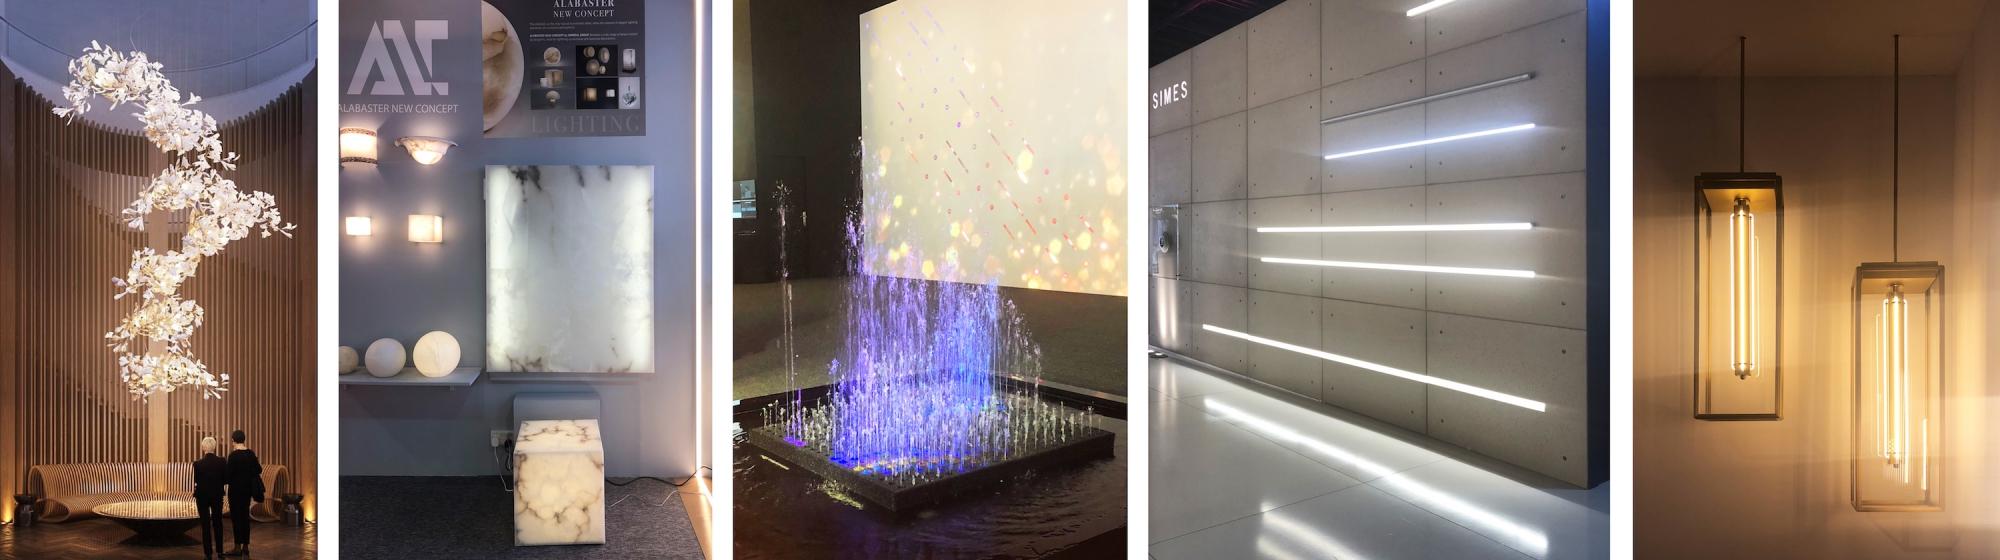 Interior Design Events Dubai